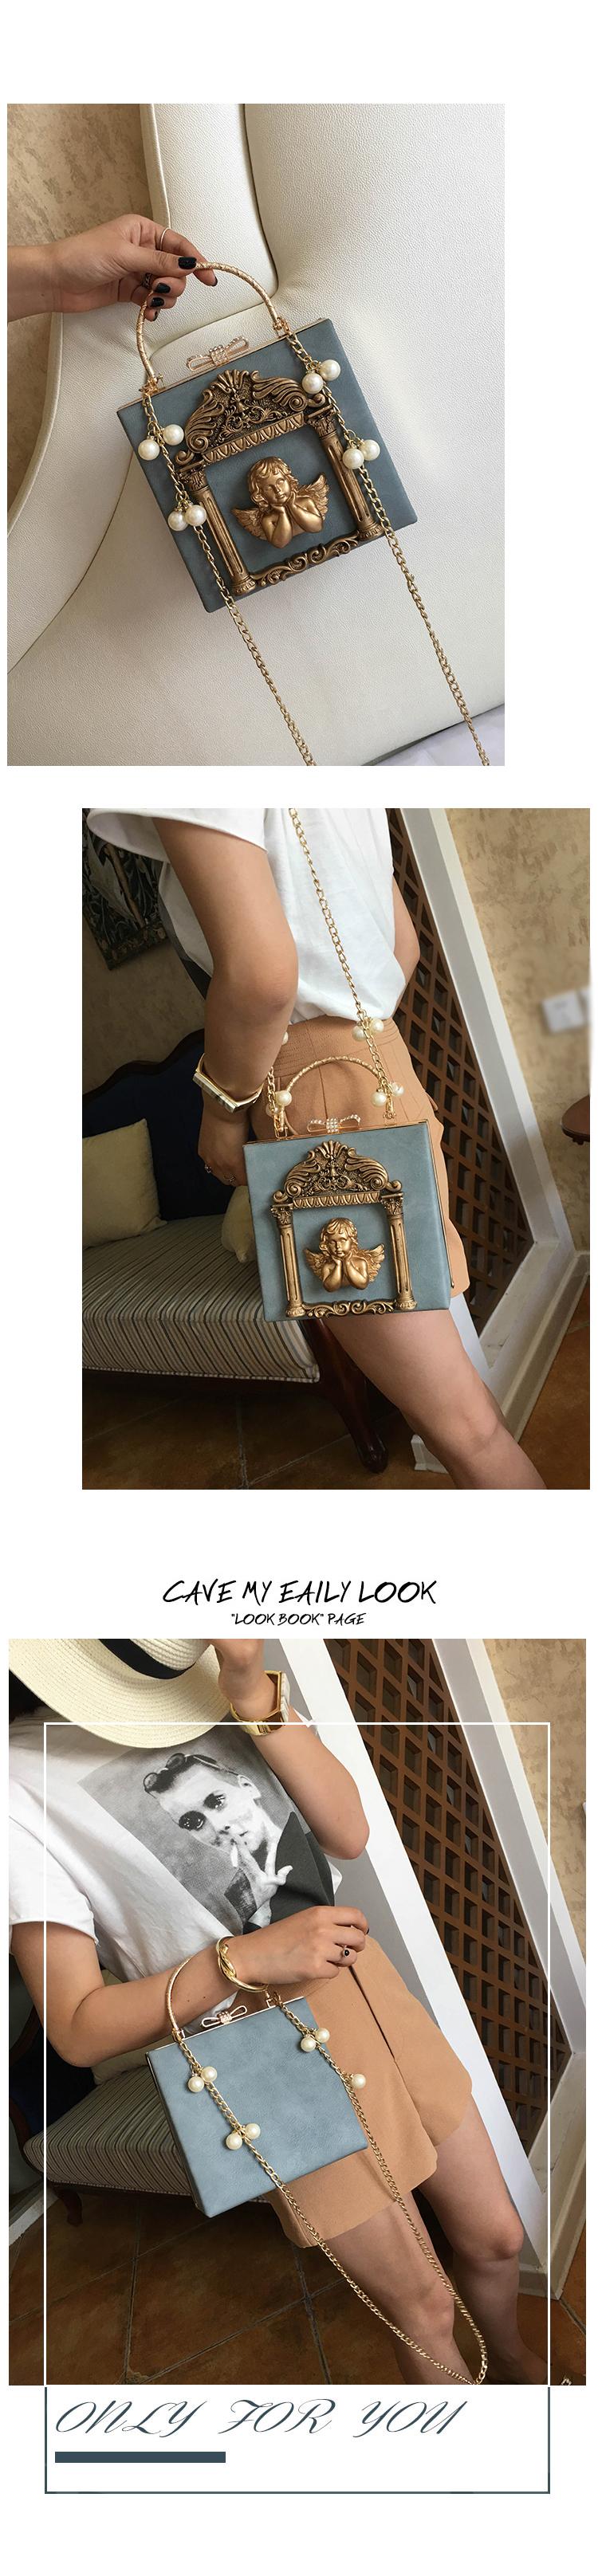 2018 NEW Rose 3D Palace Sculpture Frame Bag Luxury Handbags Women Party Bags Designer Lady Cute Shoulder Messenger Bag Sac Tote 23